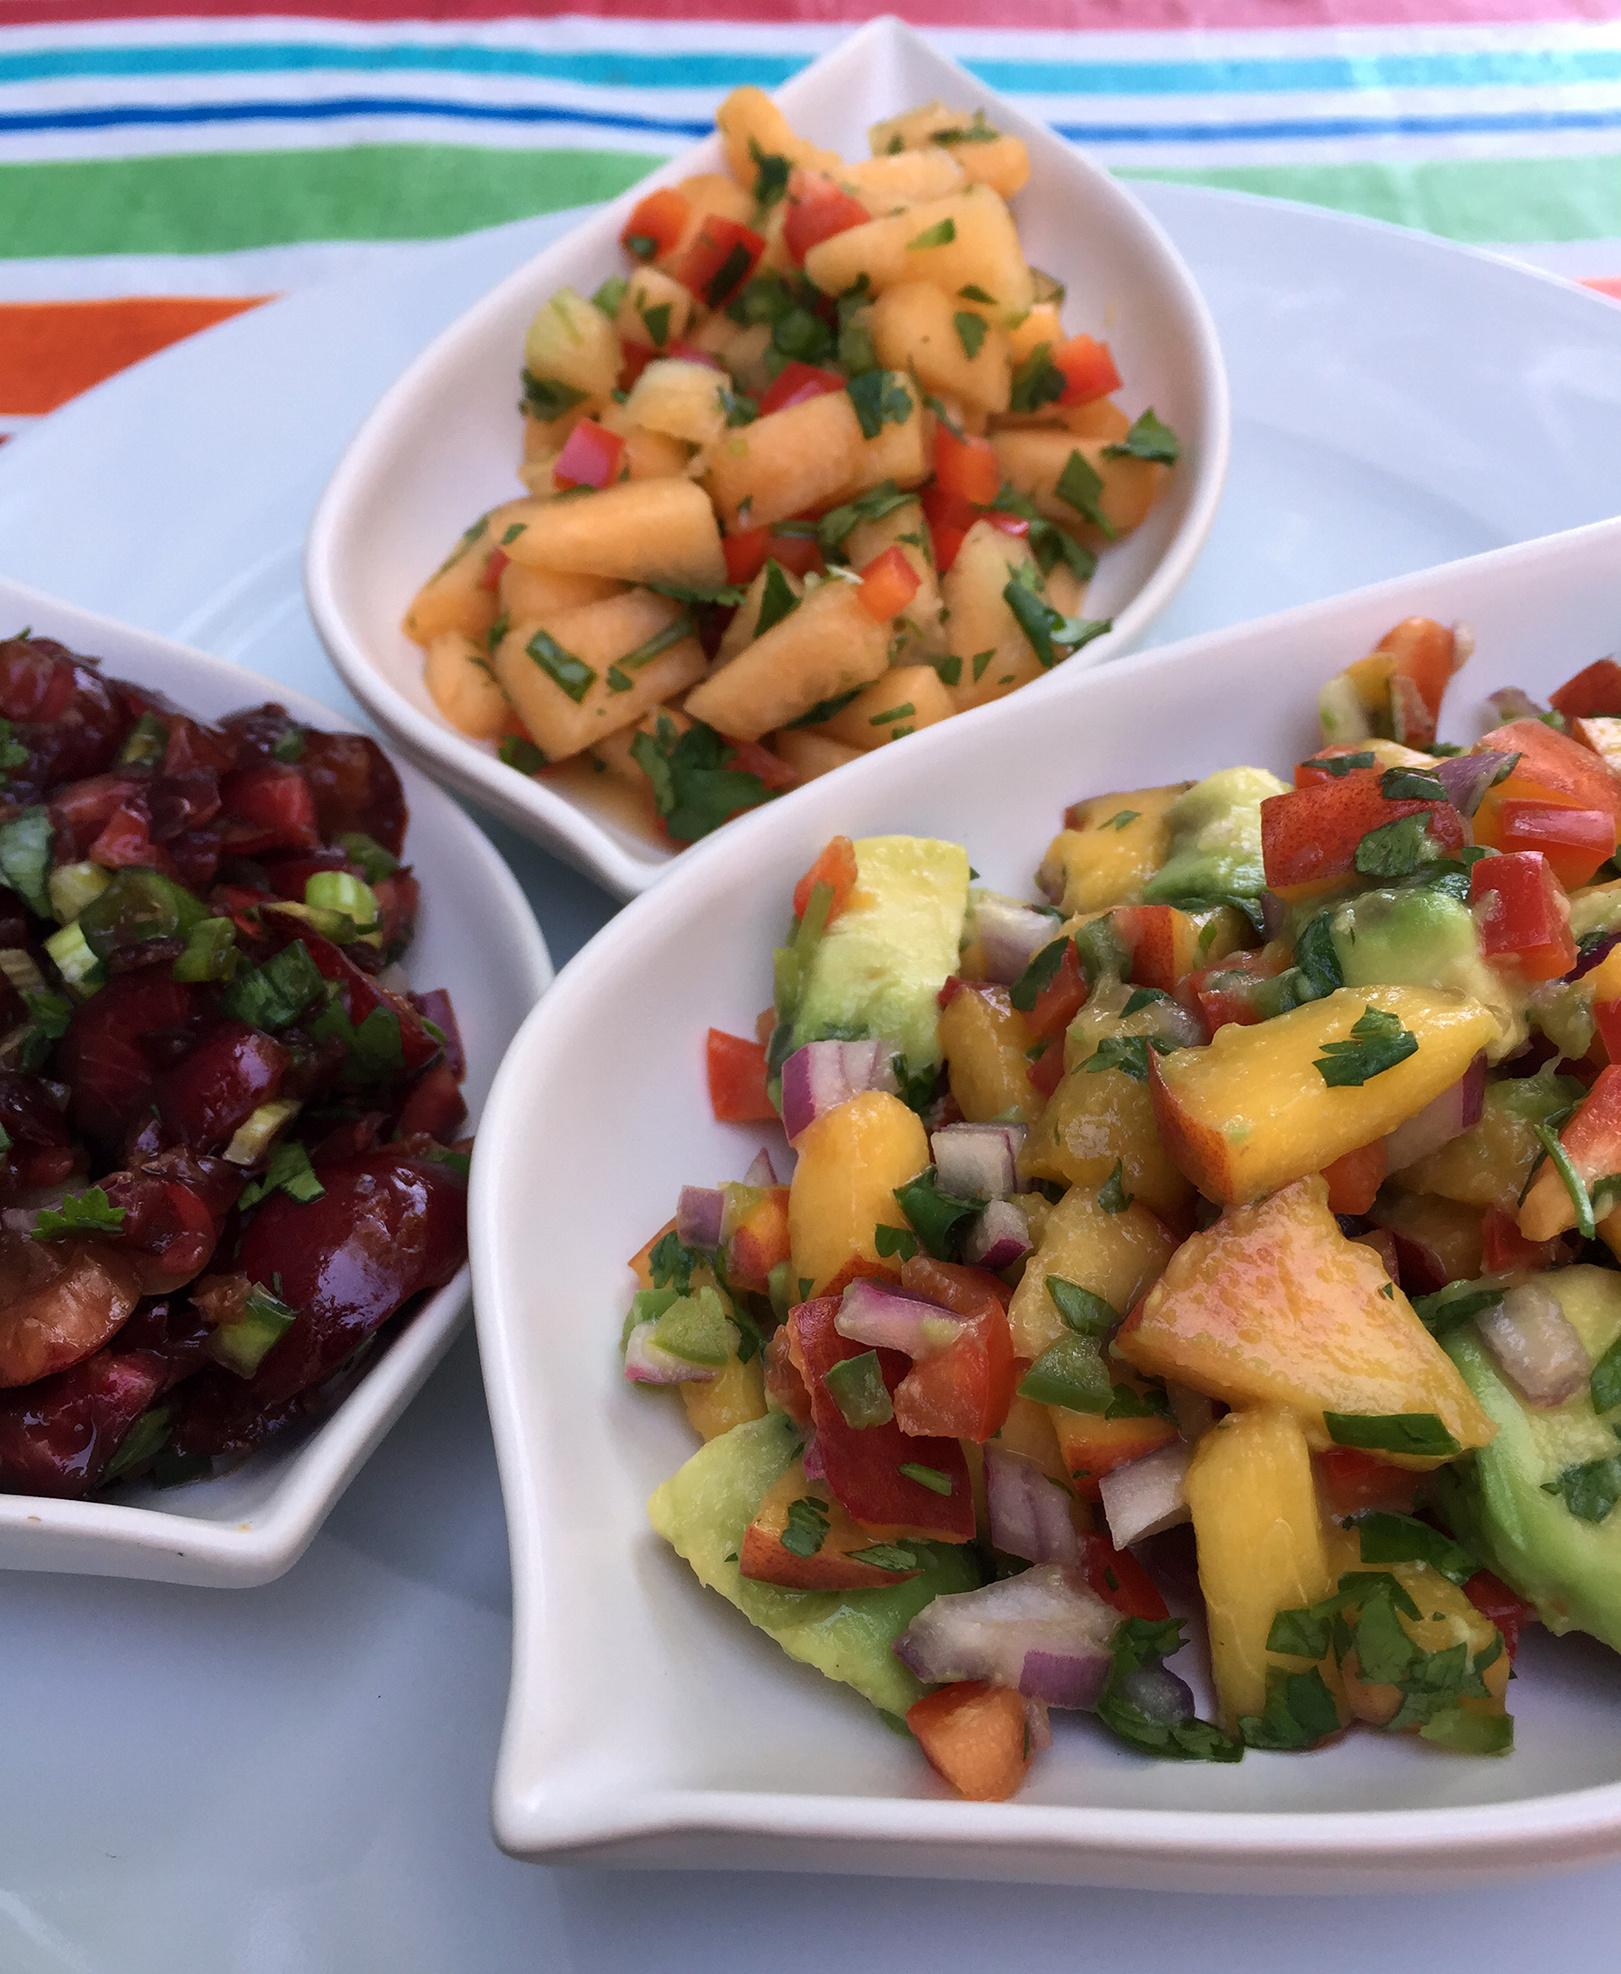 Salsas supply summer flexibility | The Spokesman-Review